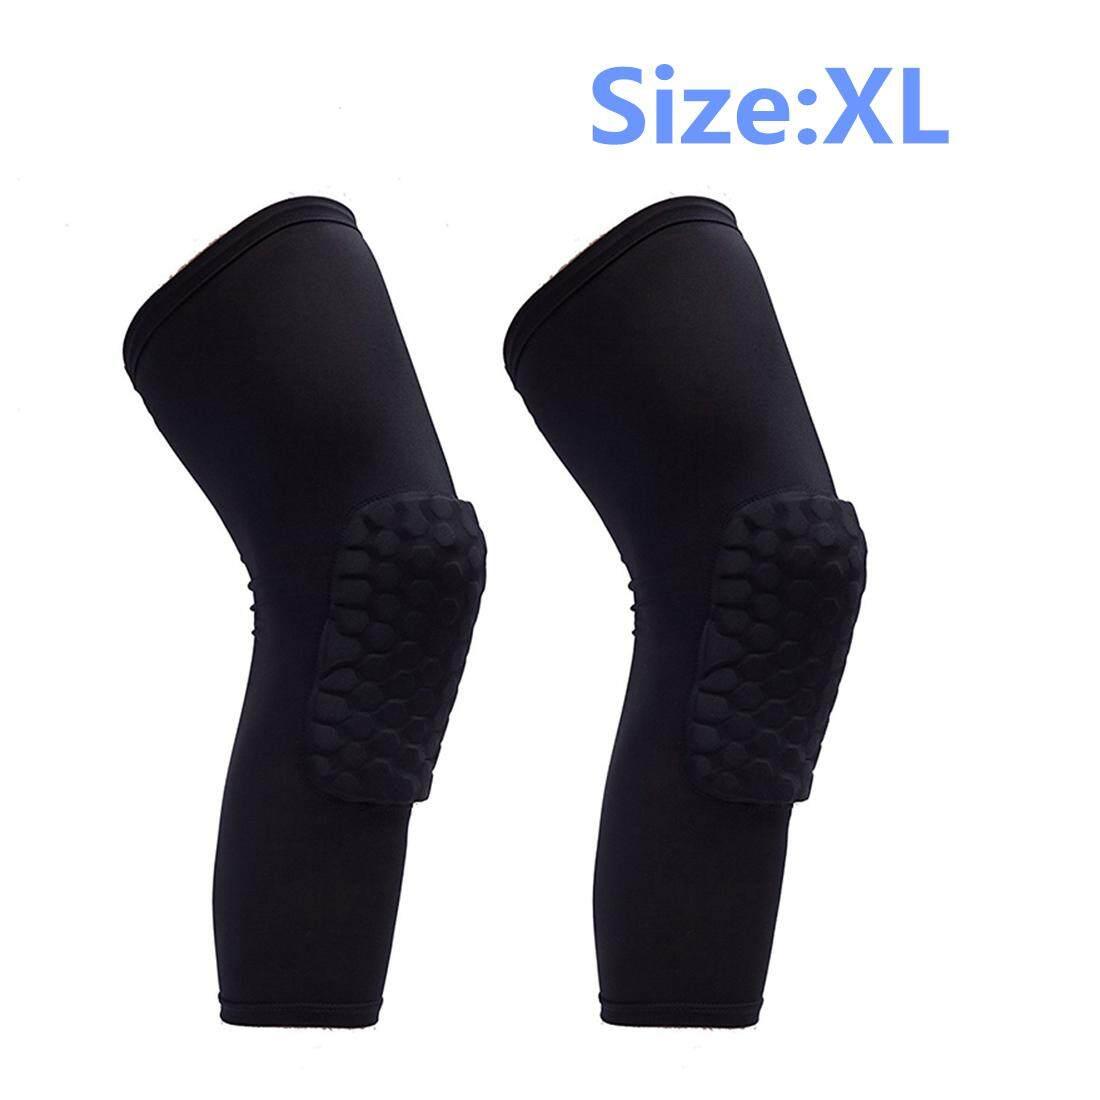 YBC 2Pcs Outdoor Sports Kneepad Honeycomb Knee Pads Leg Protective Pad - intl